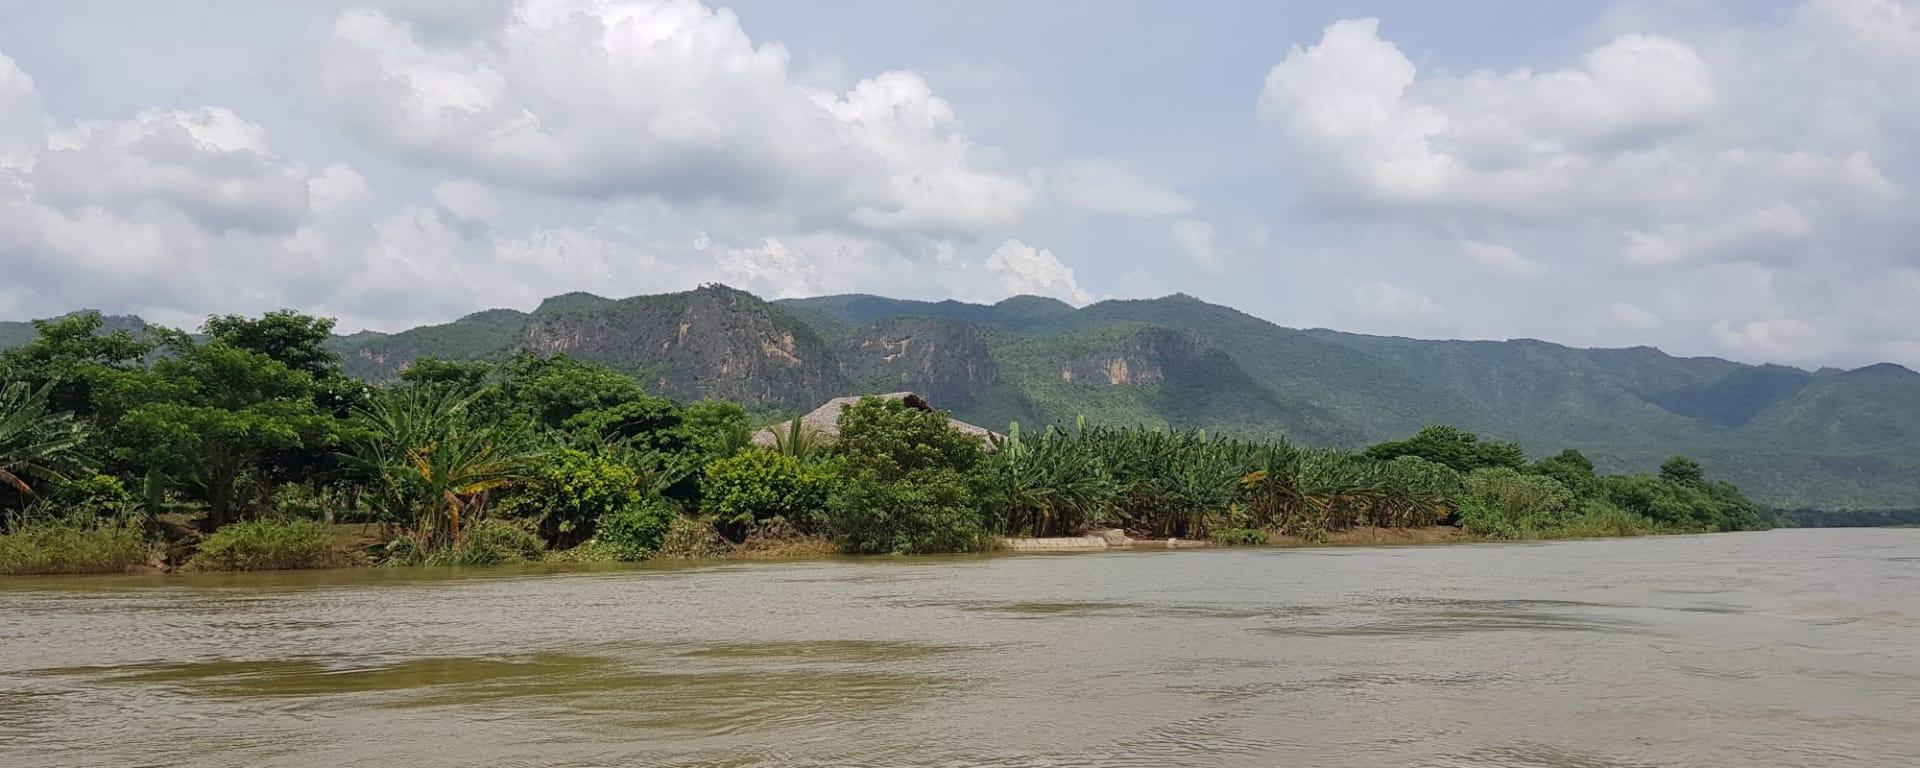 Ursprüngliches Dorfleben am Dohtawaddy Fluss in Mandalay: Dohtawaddy River